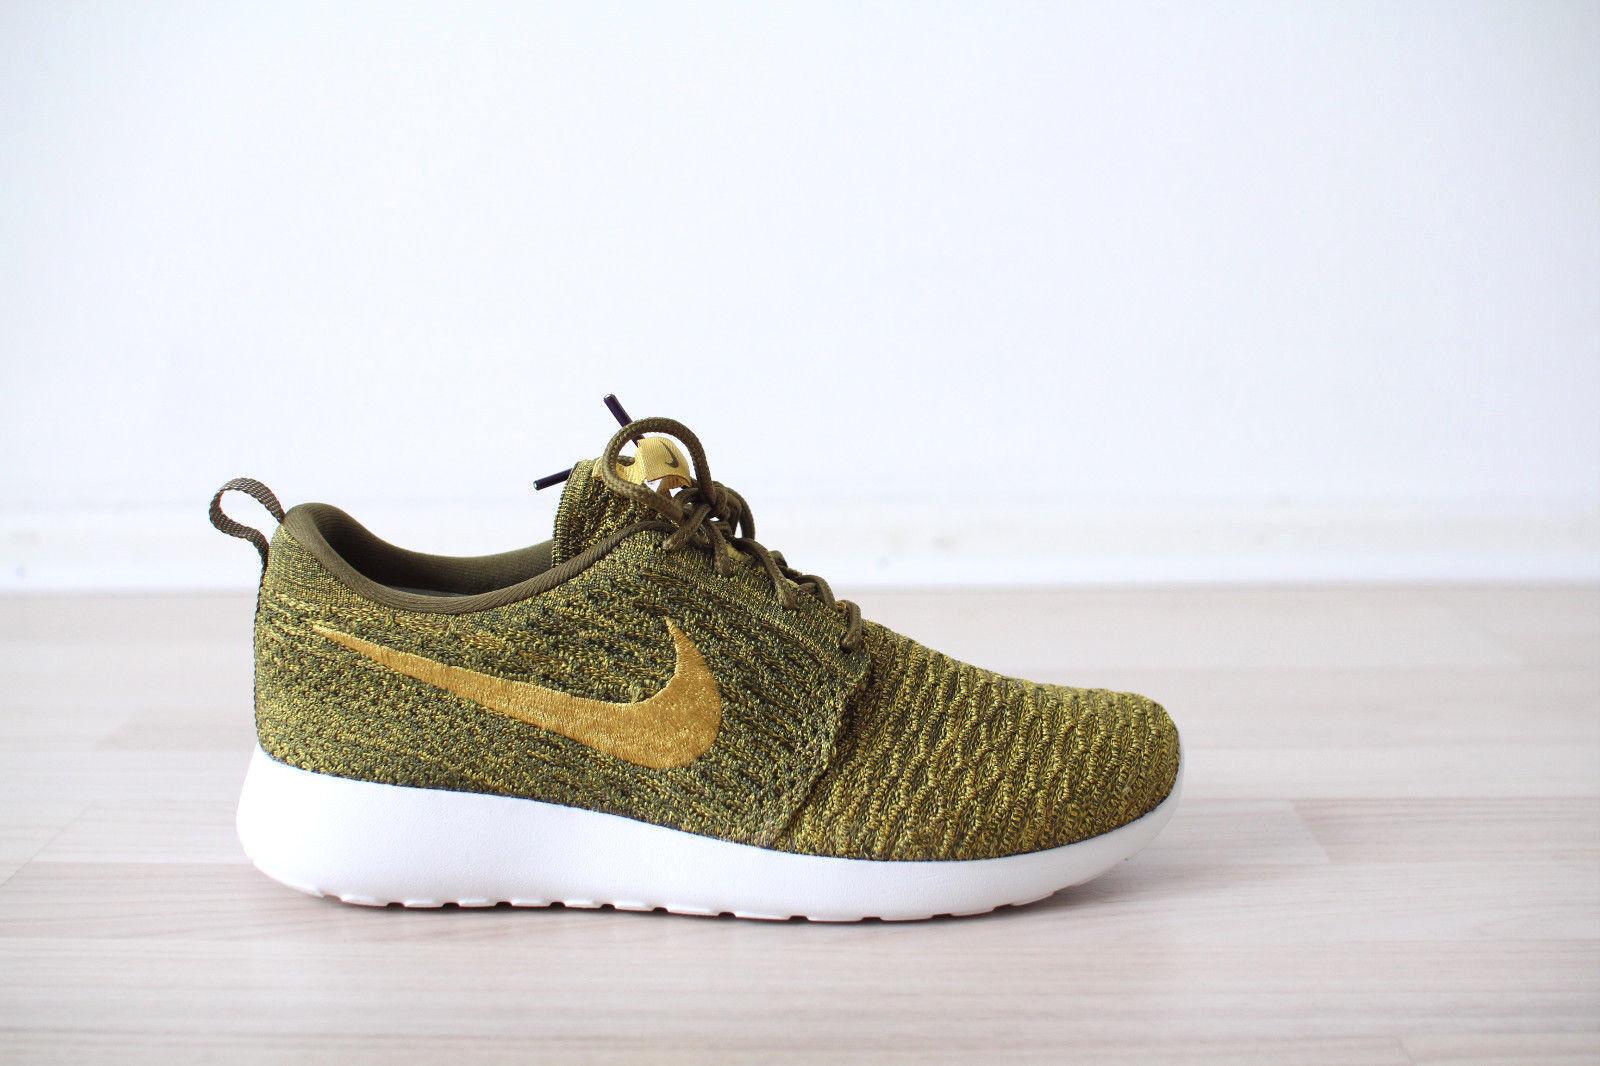 Nike Herren Sneaker in Größe EUR 39 Nike Roshe günstig